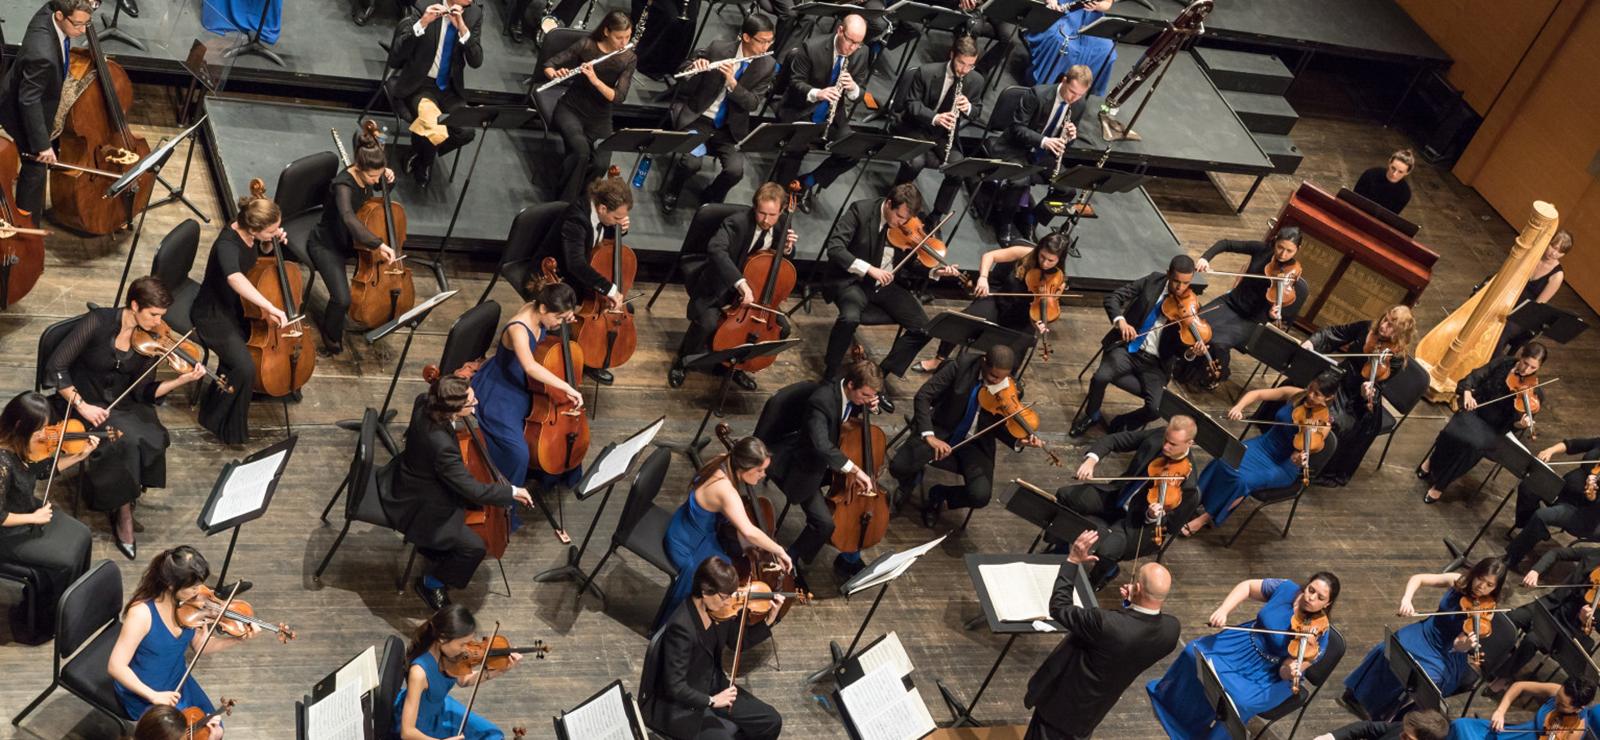 [Mahler's Seventh Symphony] Photo: Matt Dine